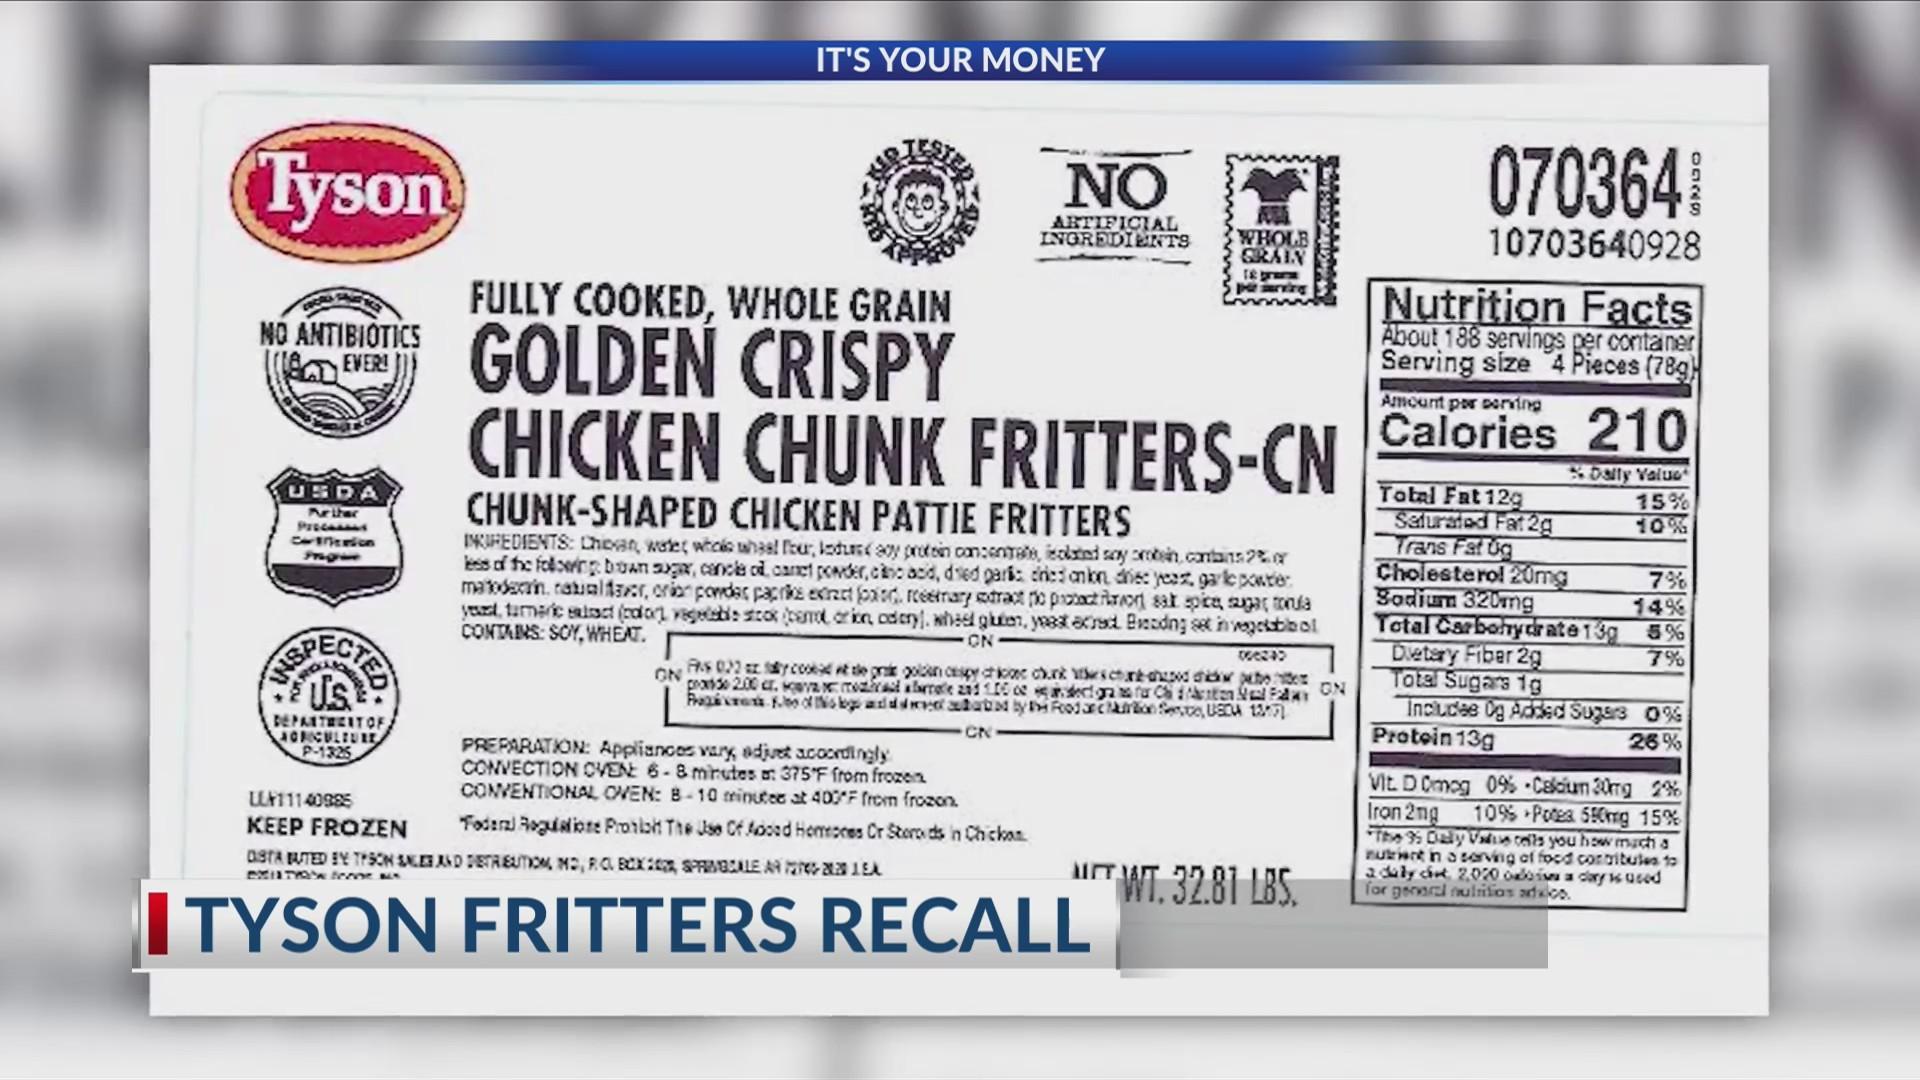 Tyson Fritters Recall